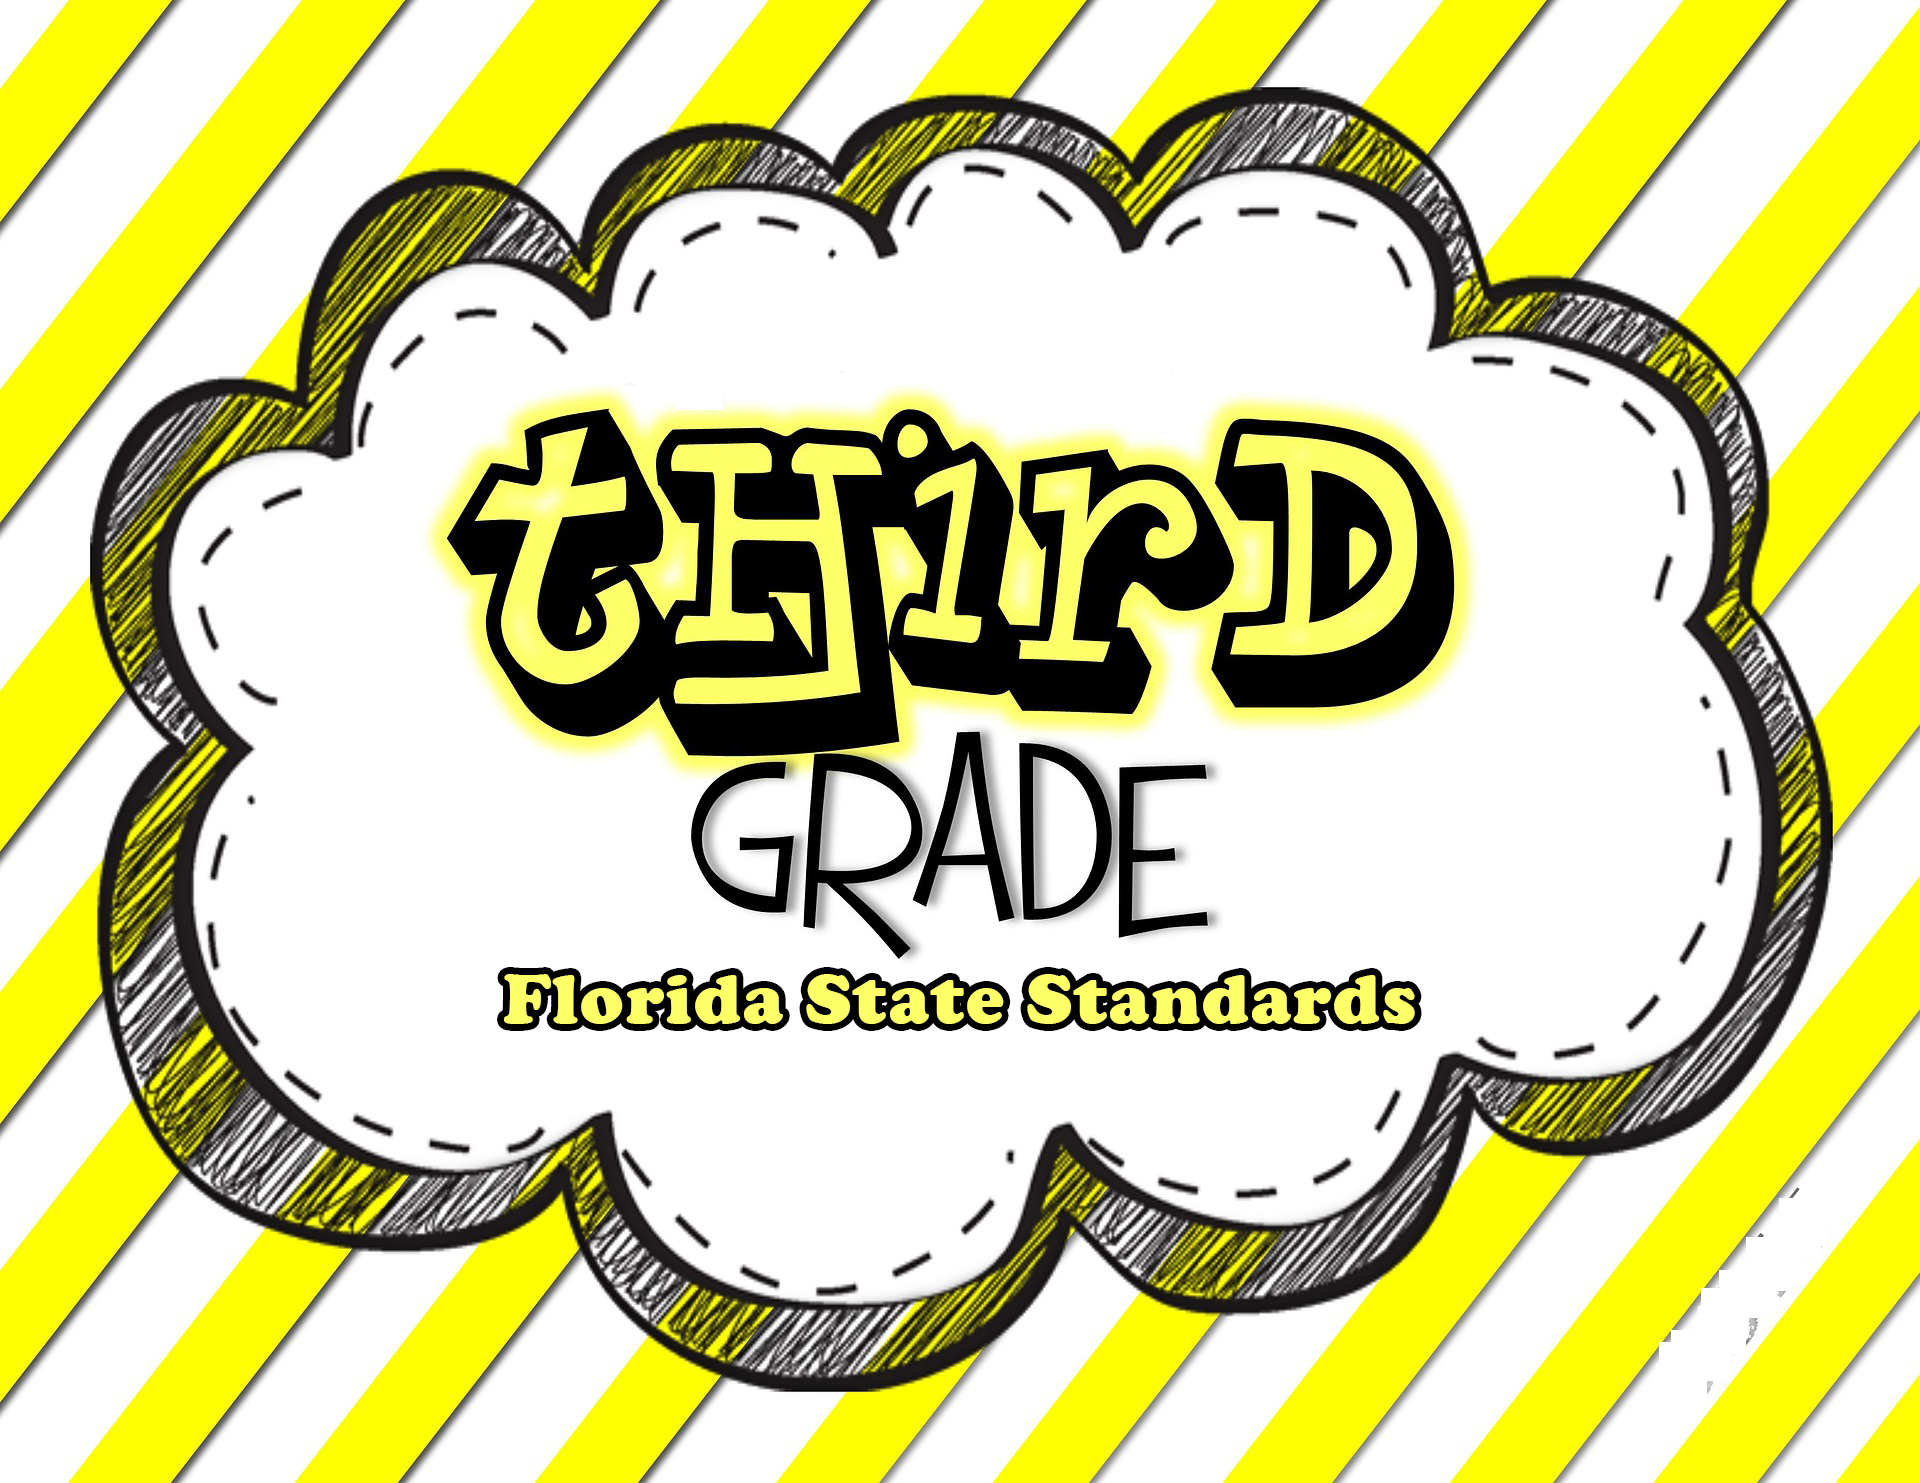 Third Grade Florida State Standards